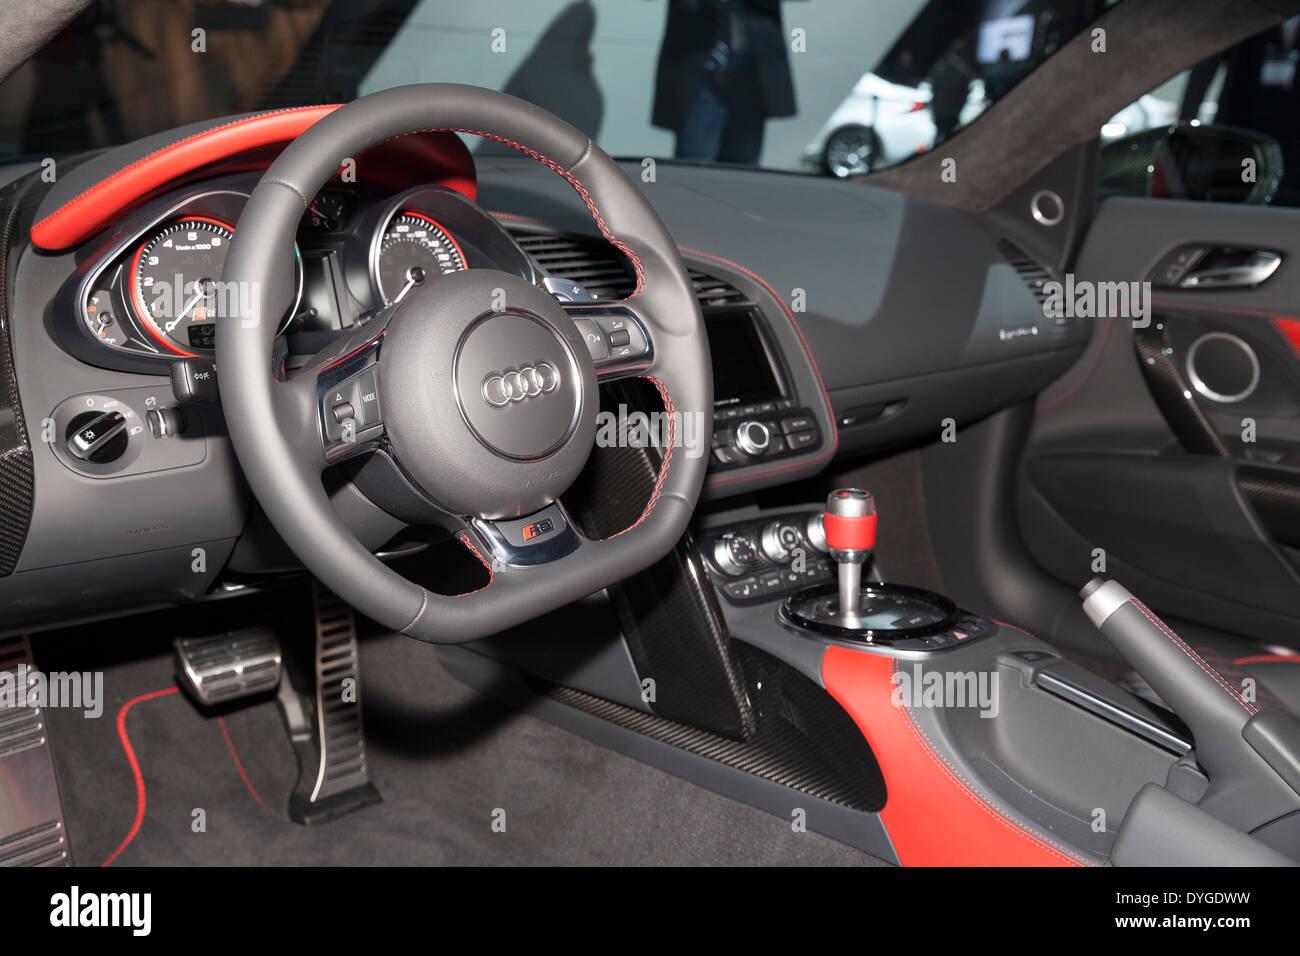 2015 audi r8 interior. interior design of audi r8 v10 plus car edition 2015 on display at new york international auto show